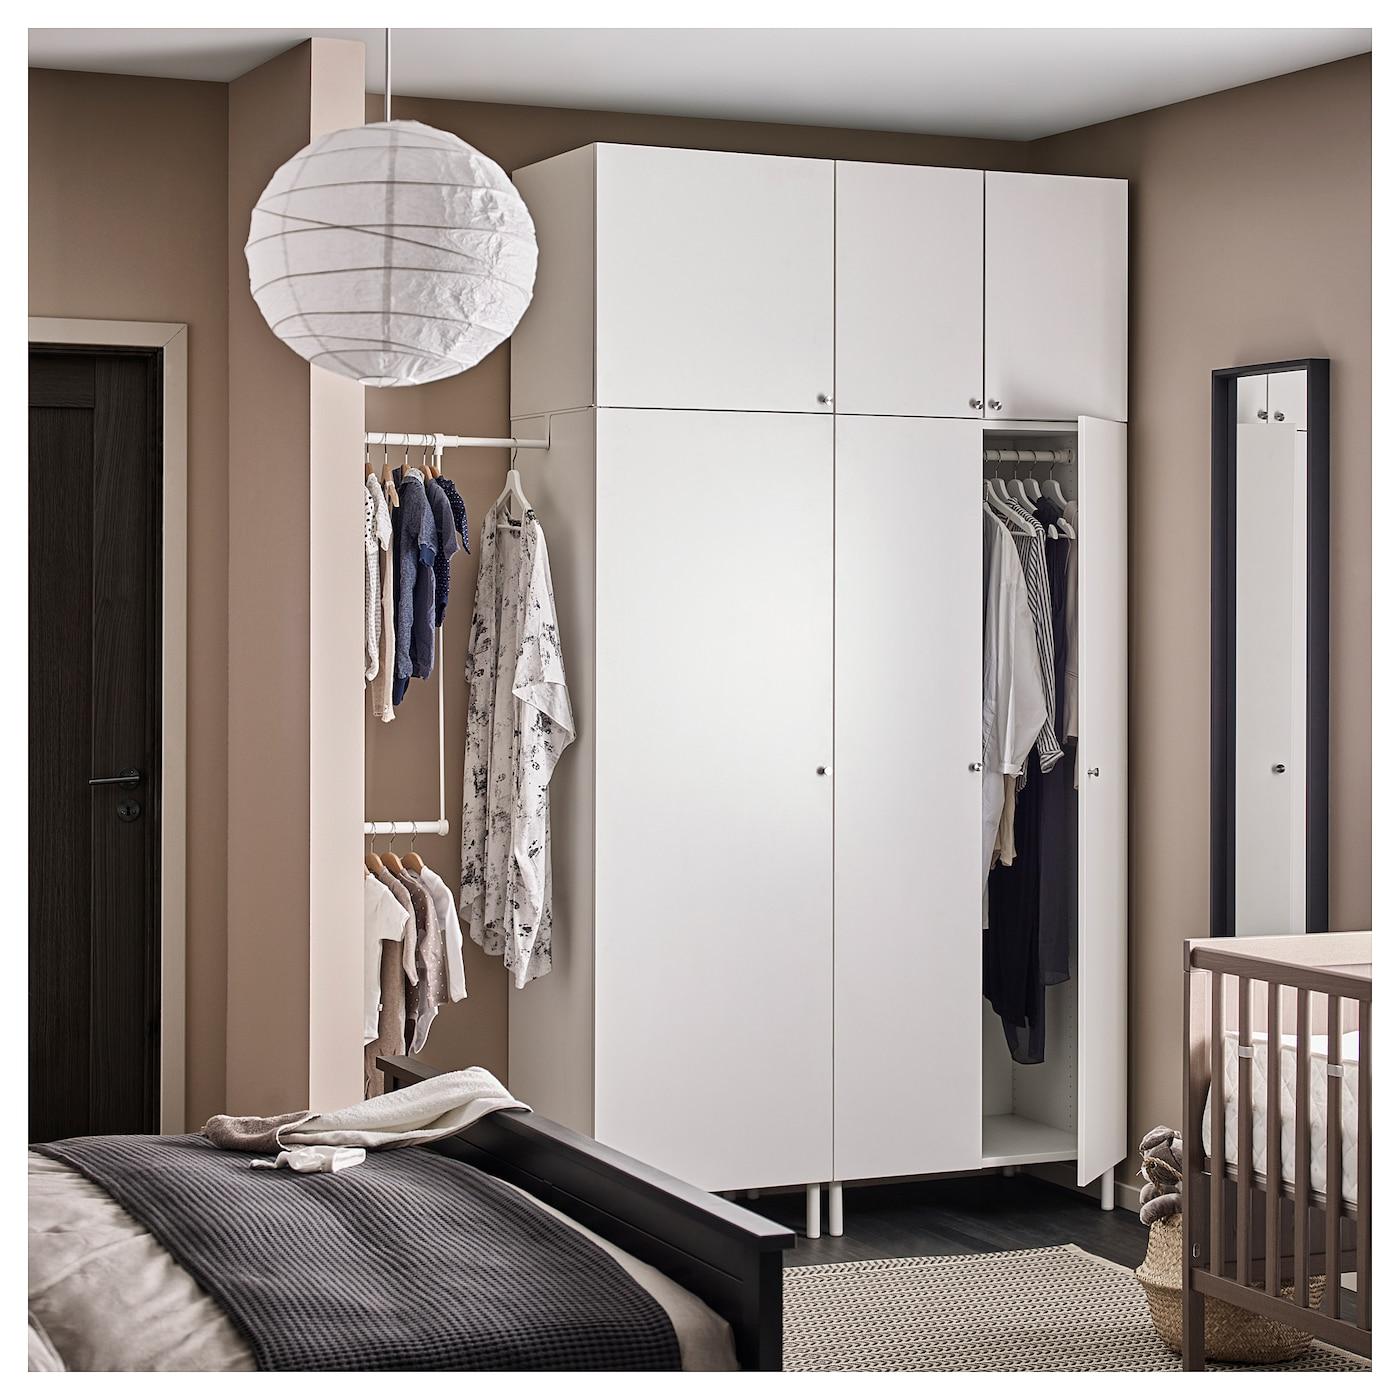 Platsa armario blanco fonnes blanco 175 200 x 57 x 251 cm ikea - Ikea armarios modulares ...